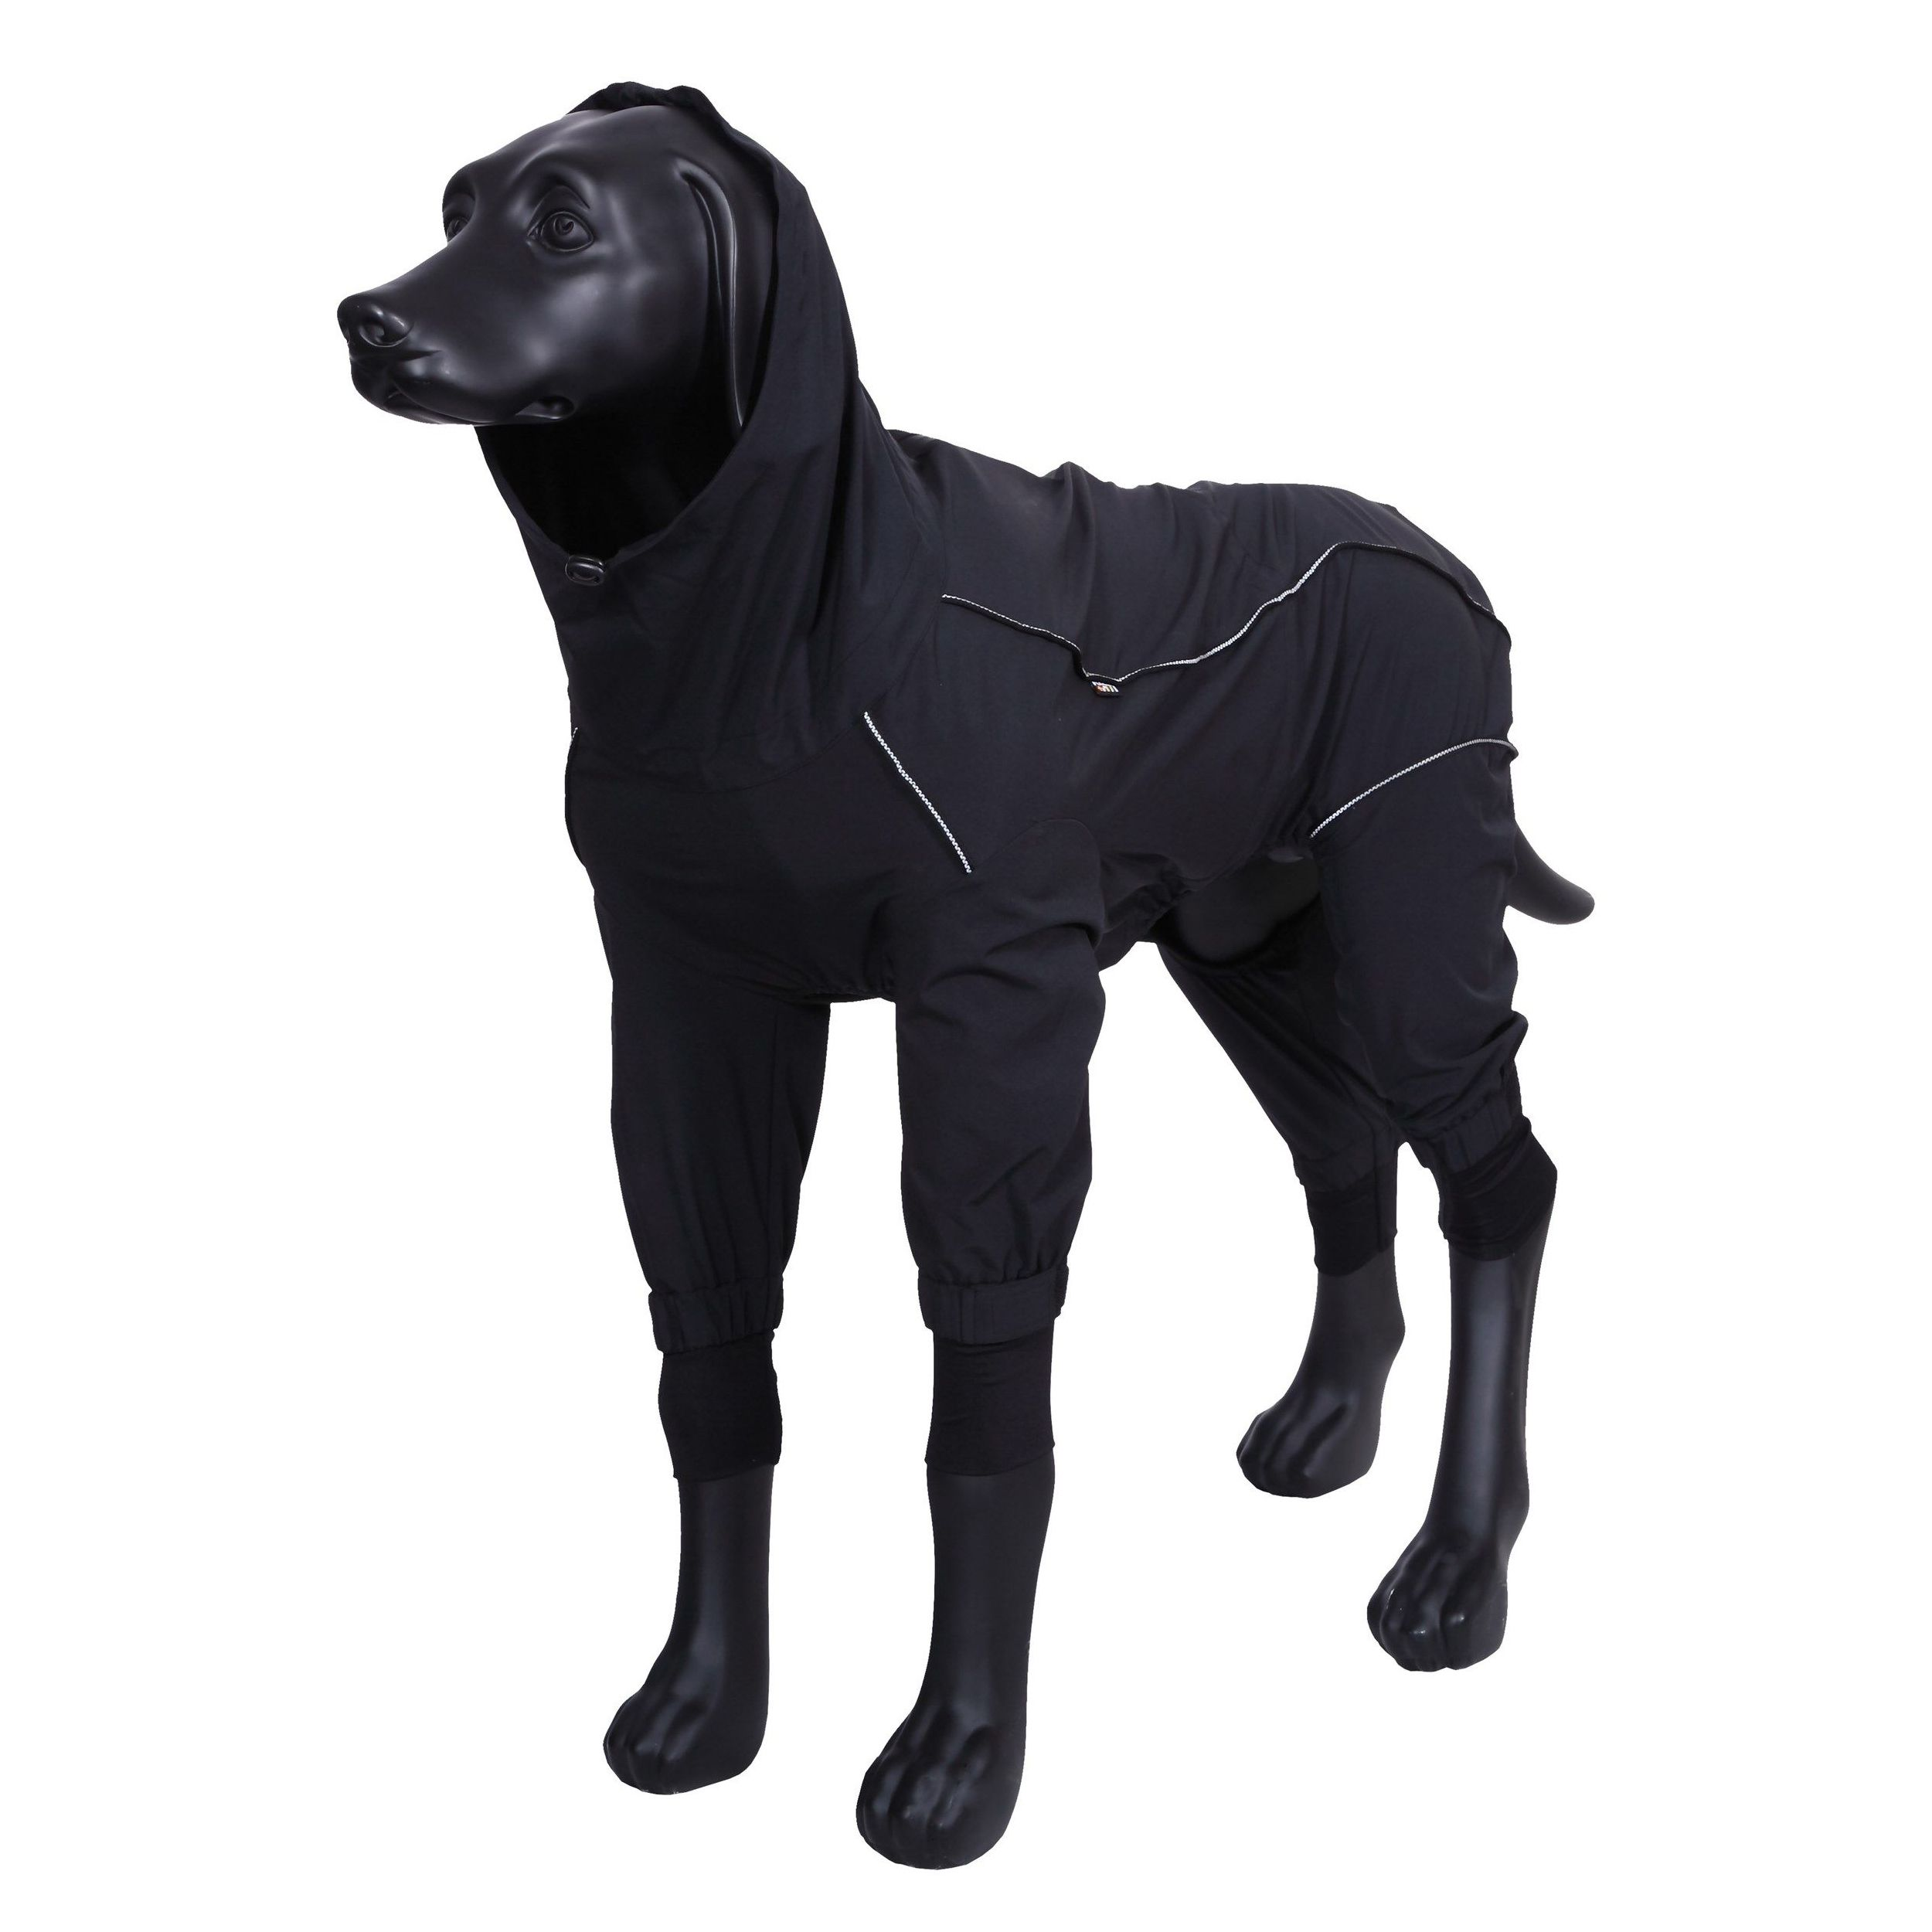 Комбинезон для собак RUKKA Protect overall 2.0 25см черный недорого